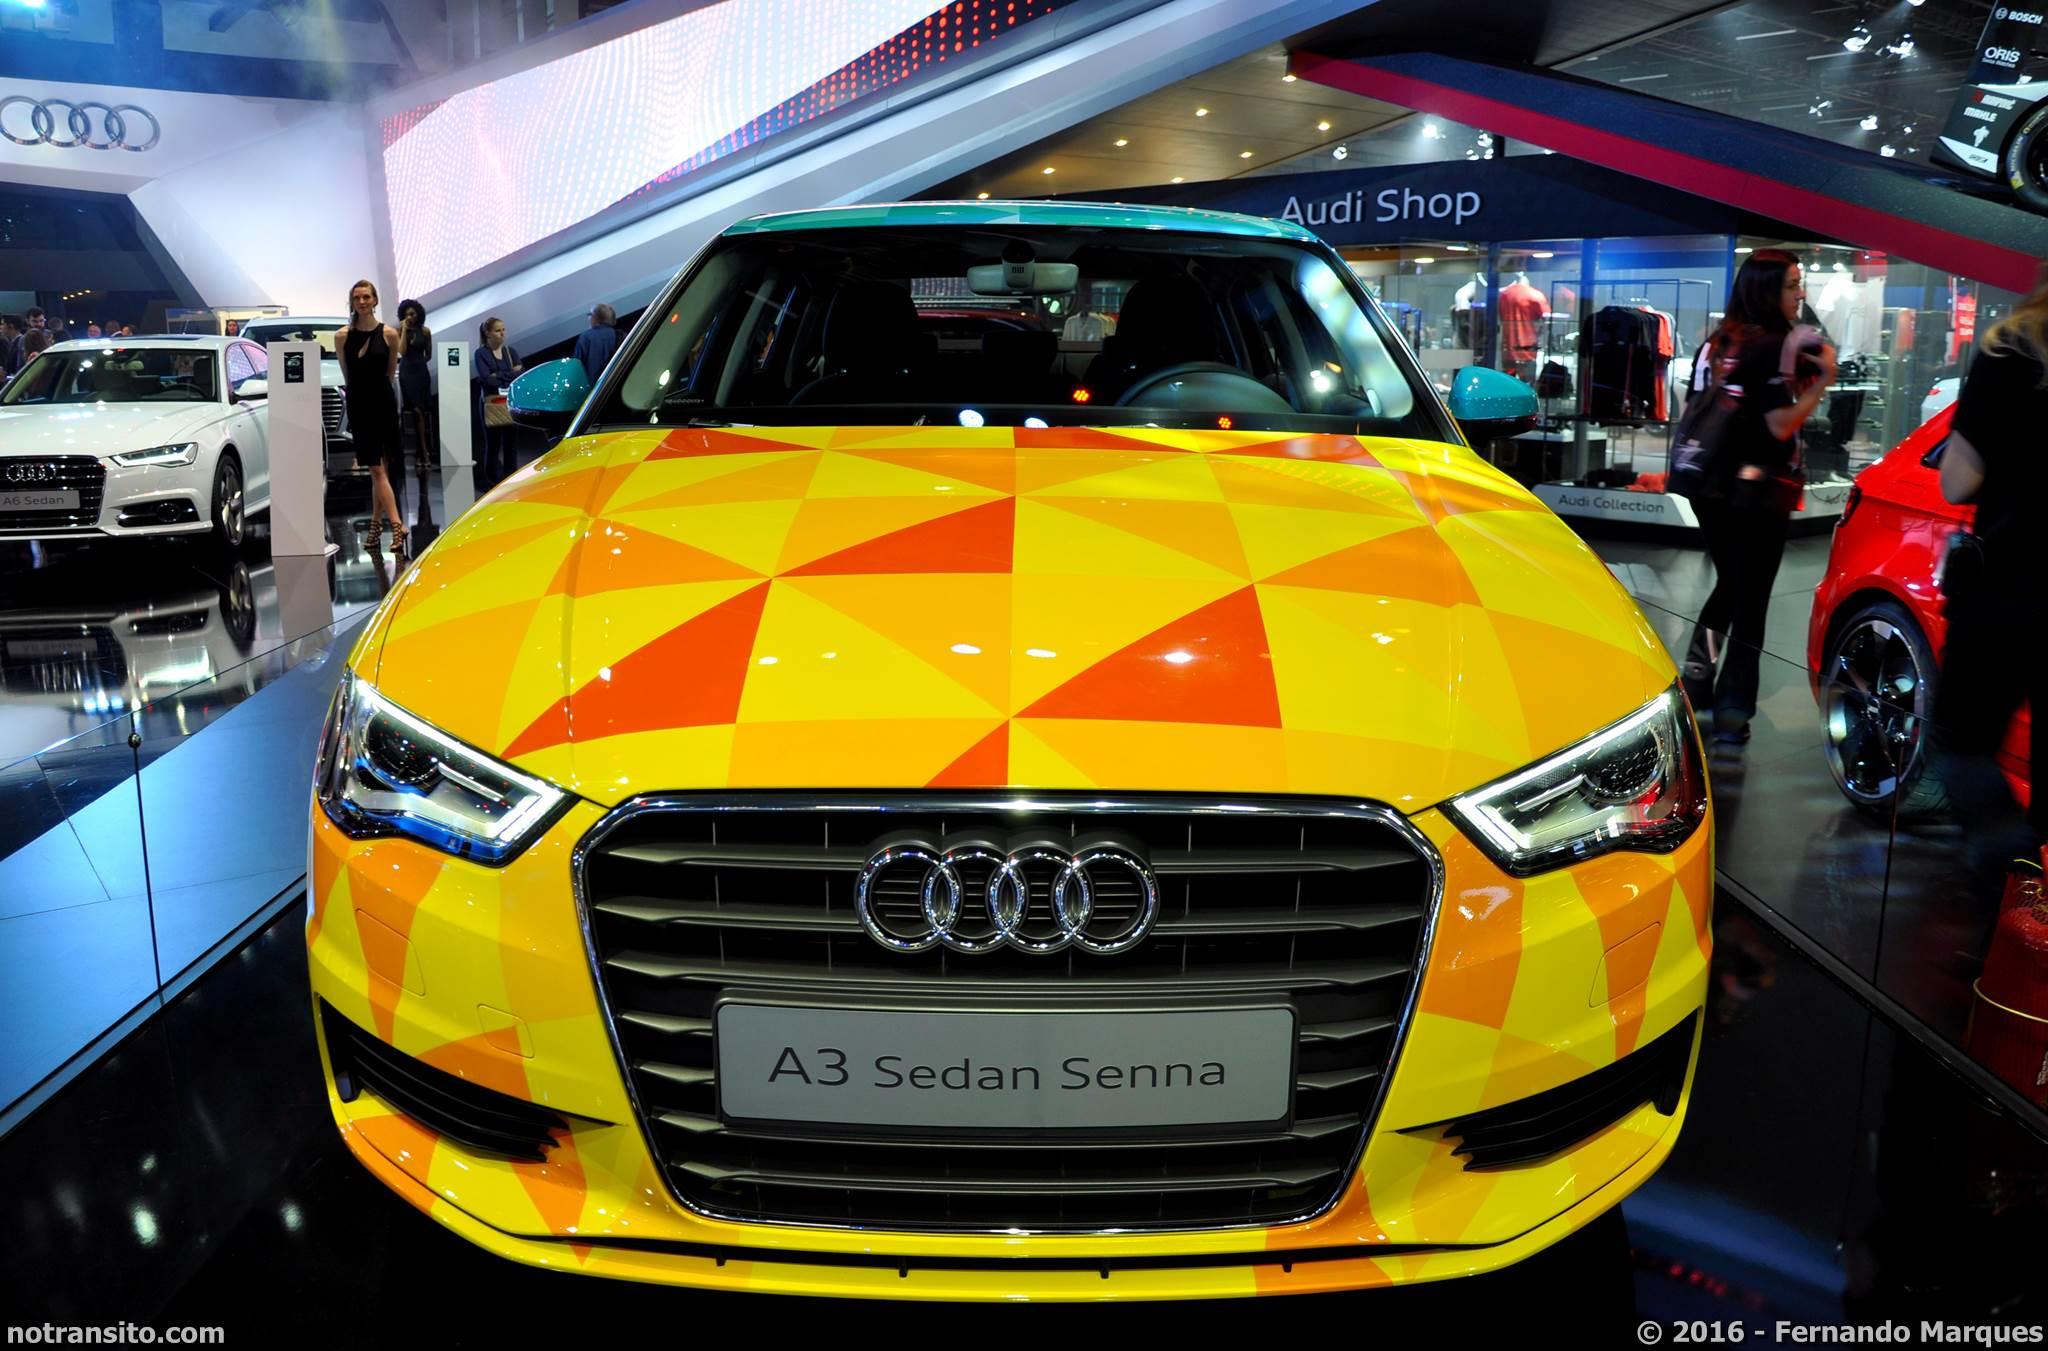 Audi A3 Sedã Salão do Automóvel 2016